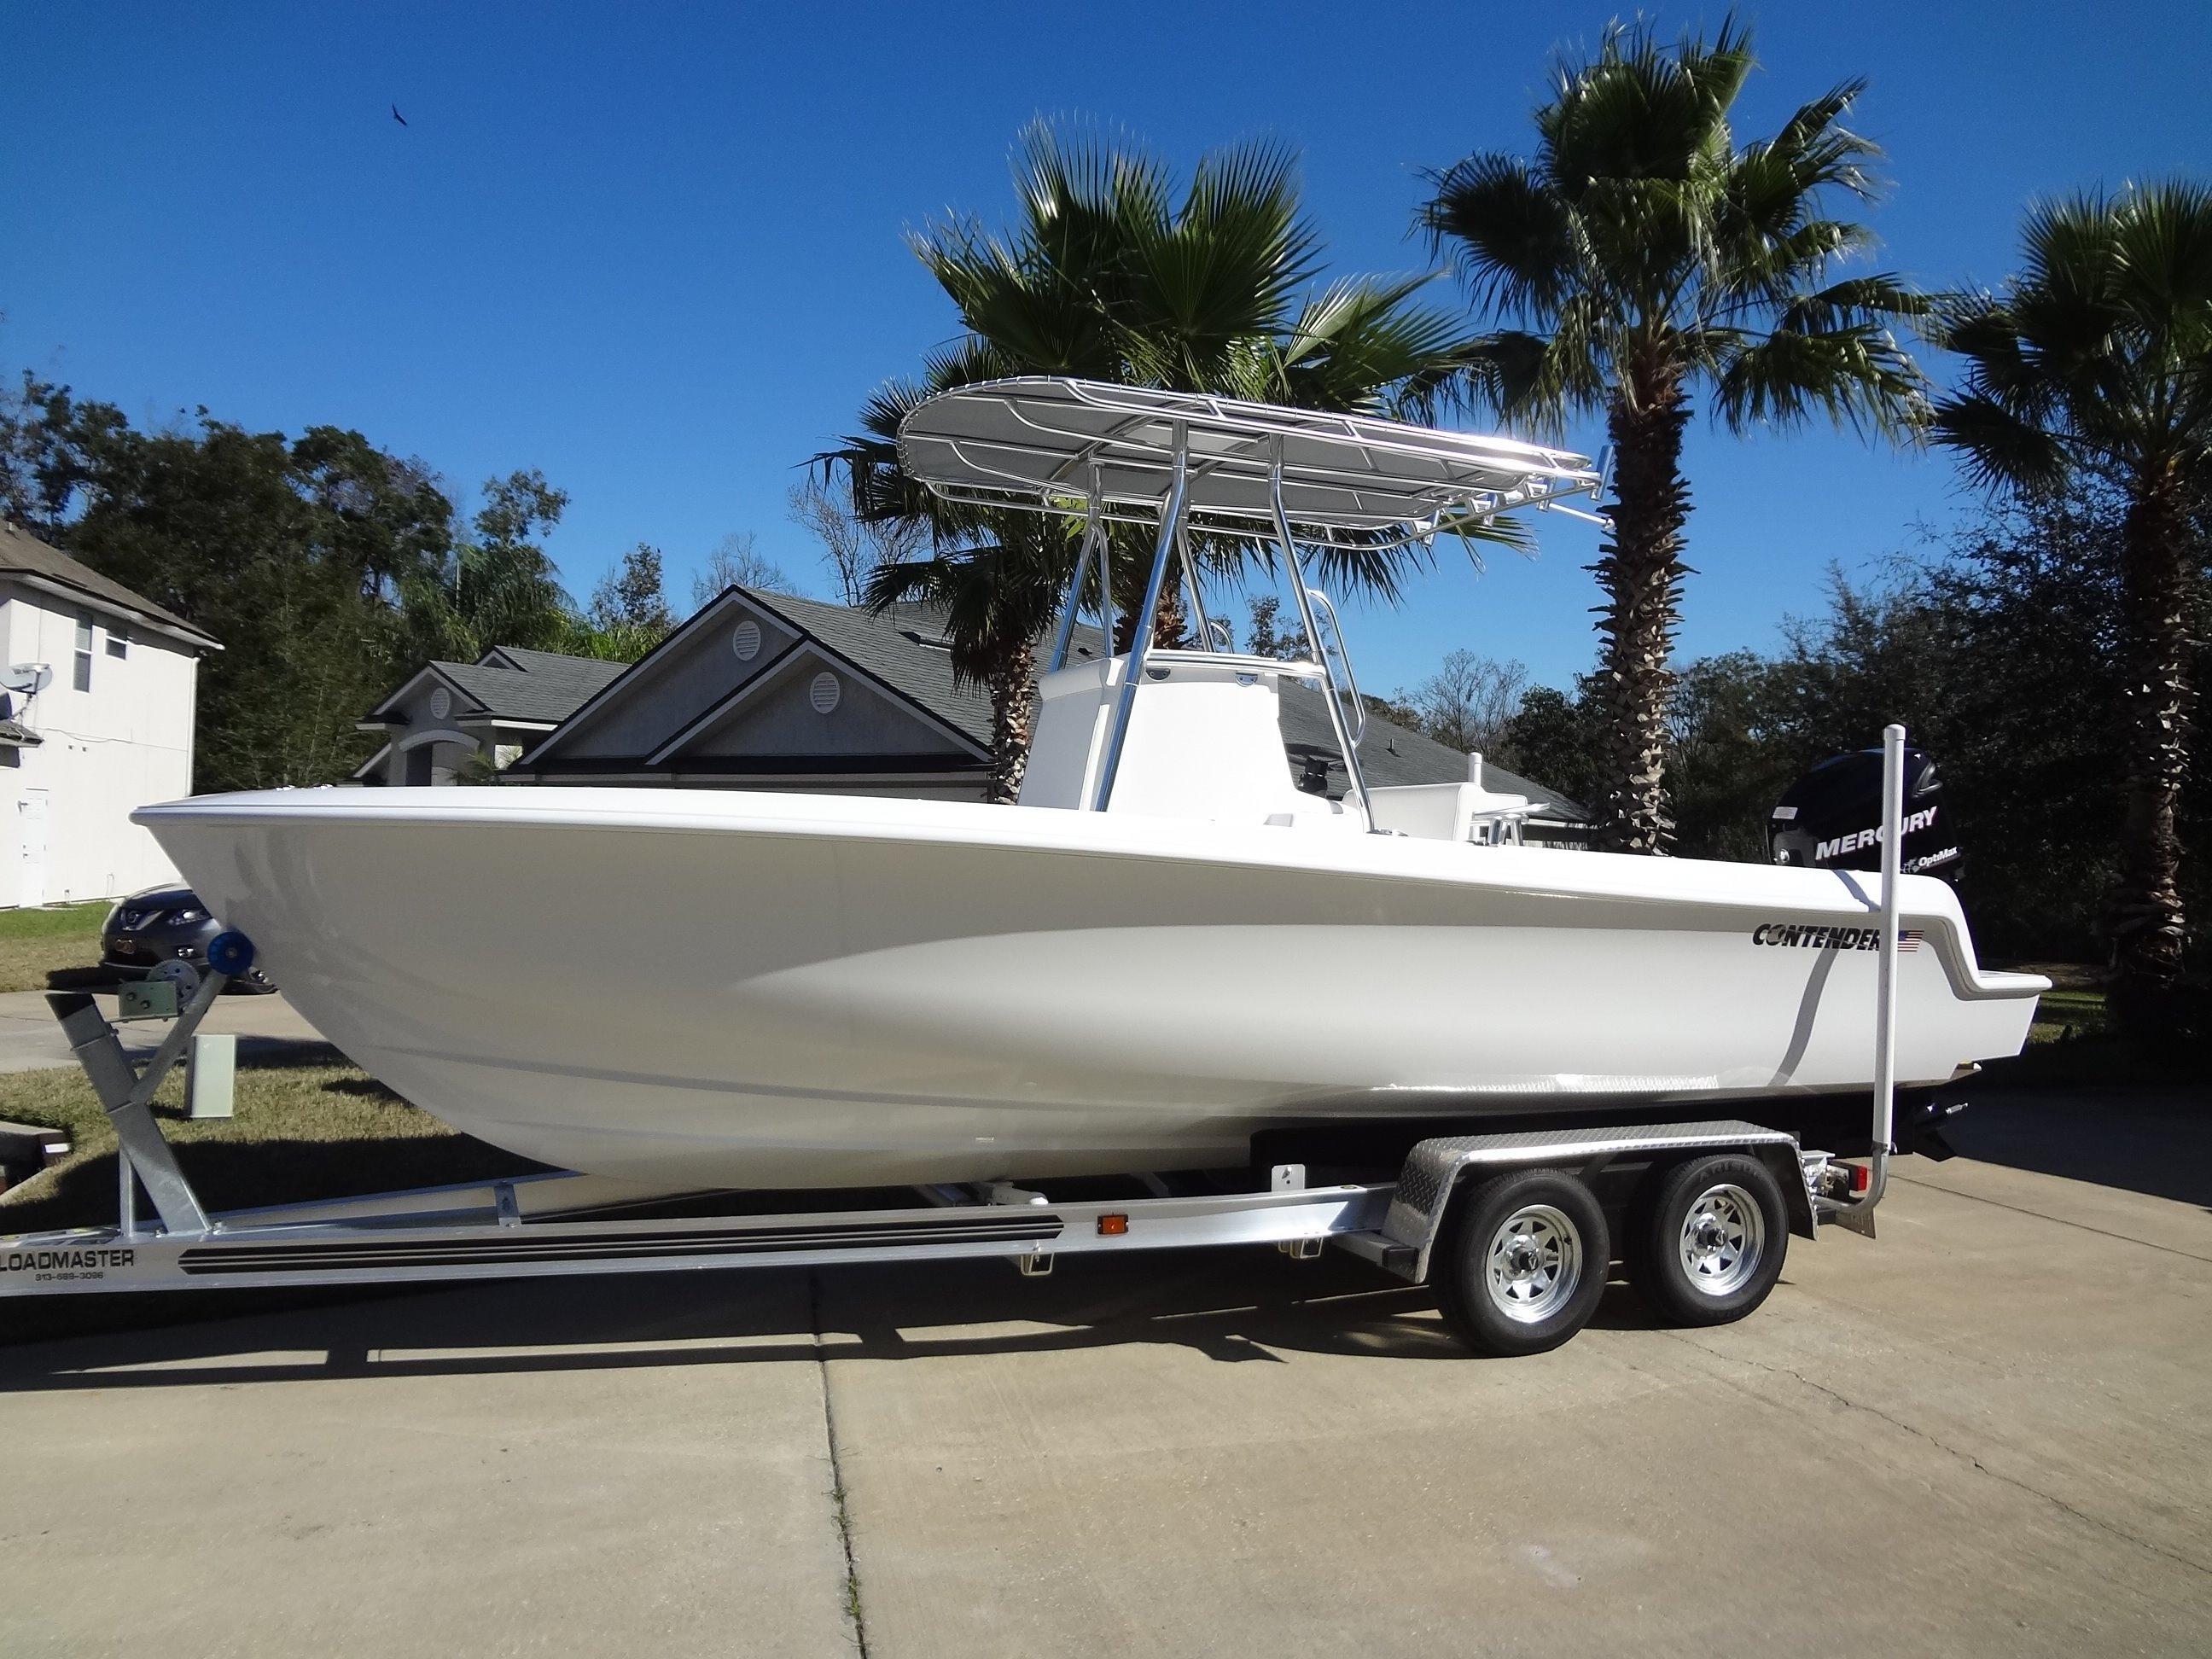 Factory Boat Parts Houston Tx News Fiberglass Boat Repair